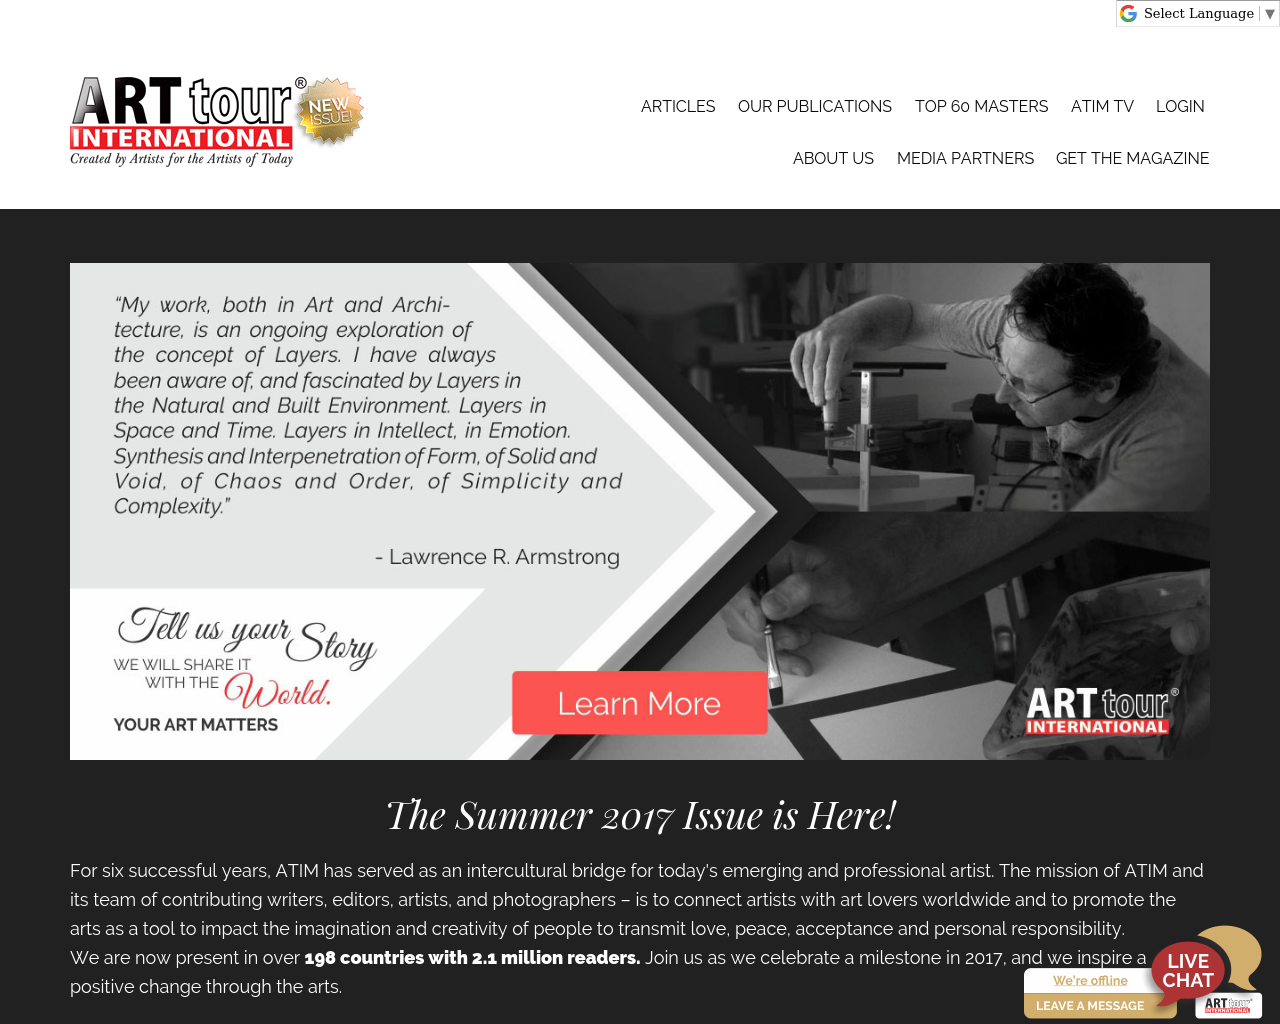 ArtTour-INTERNATIONAL-Advertising-Reviews-Pricing